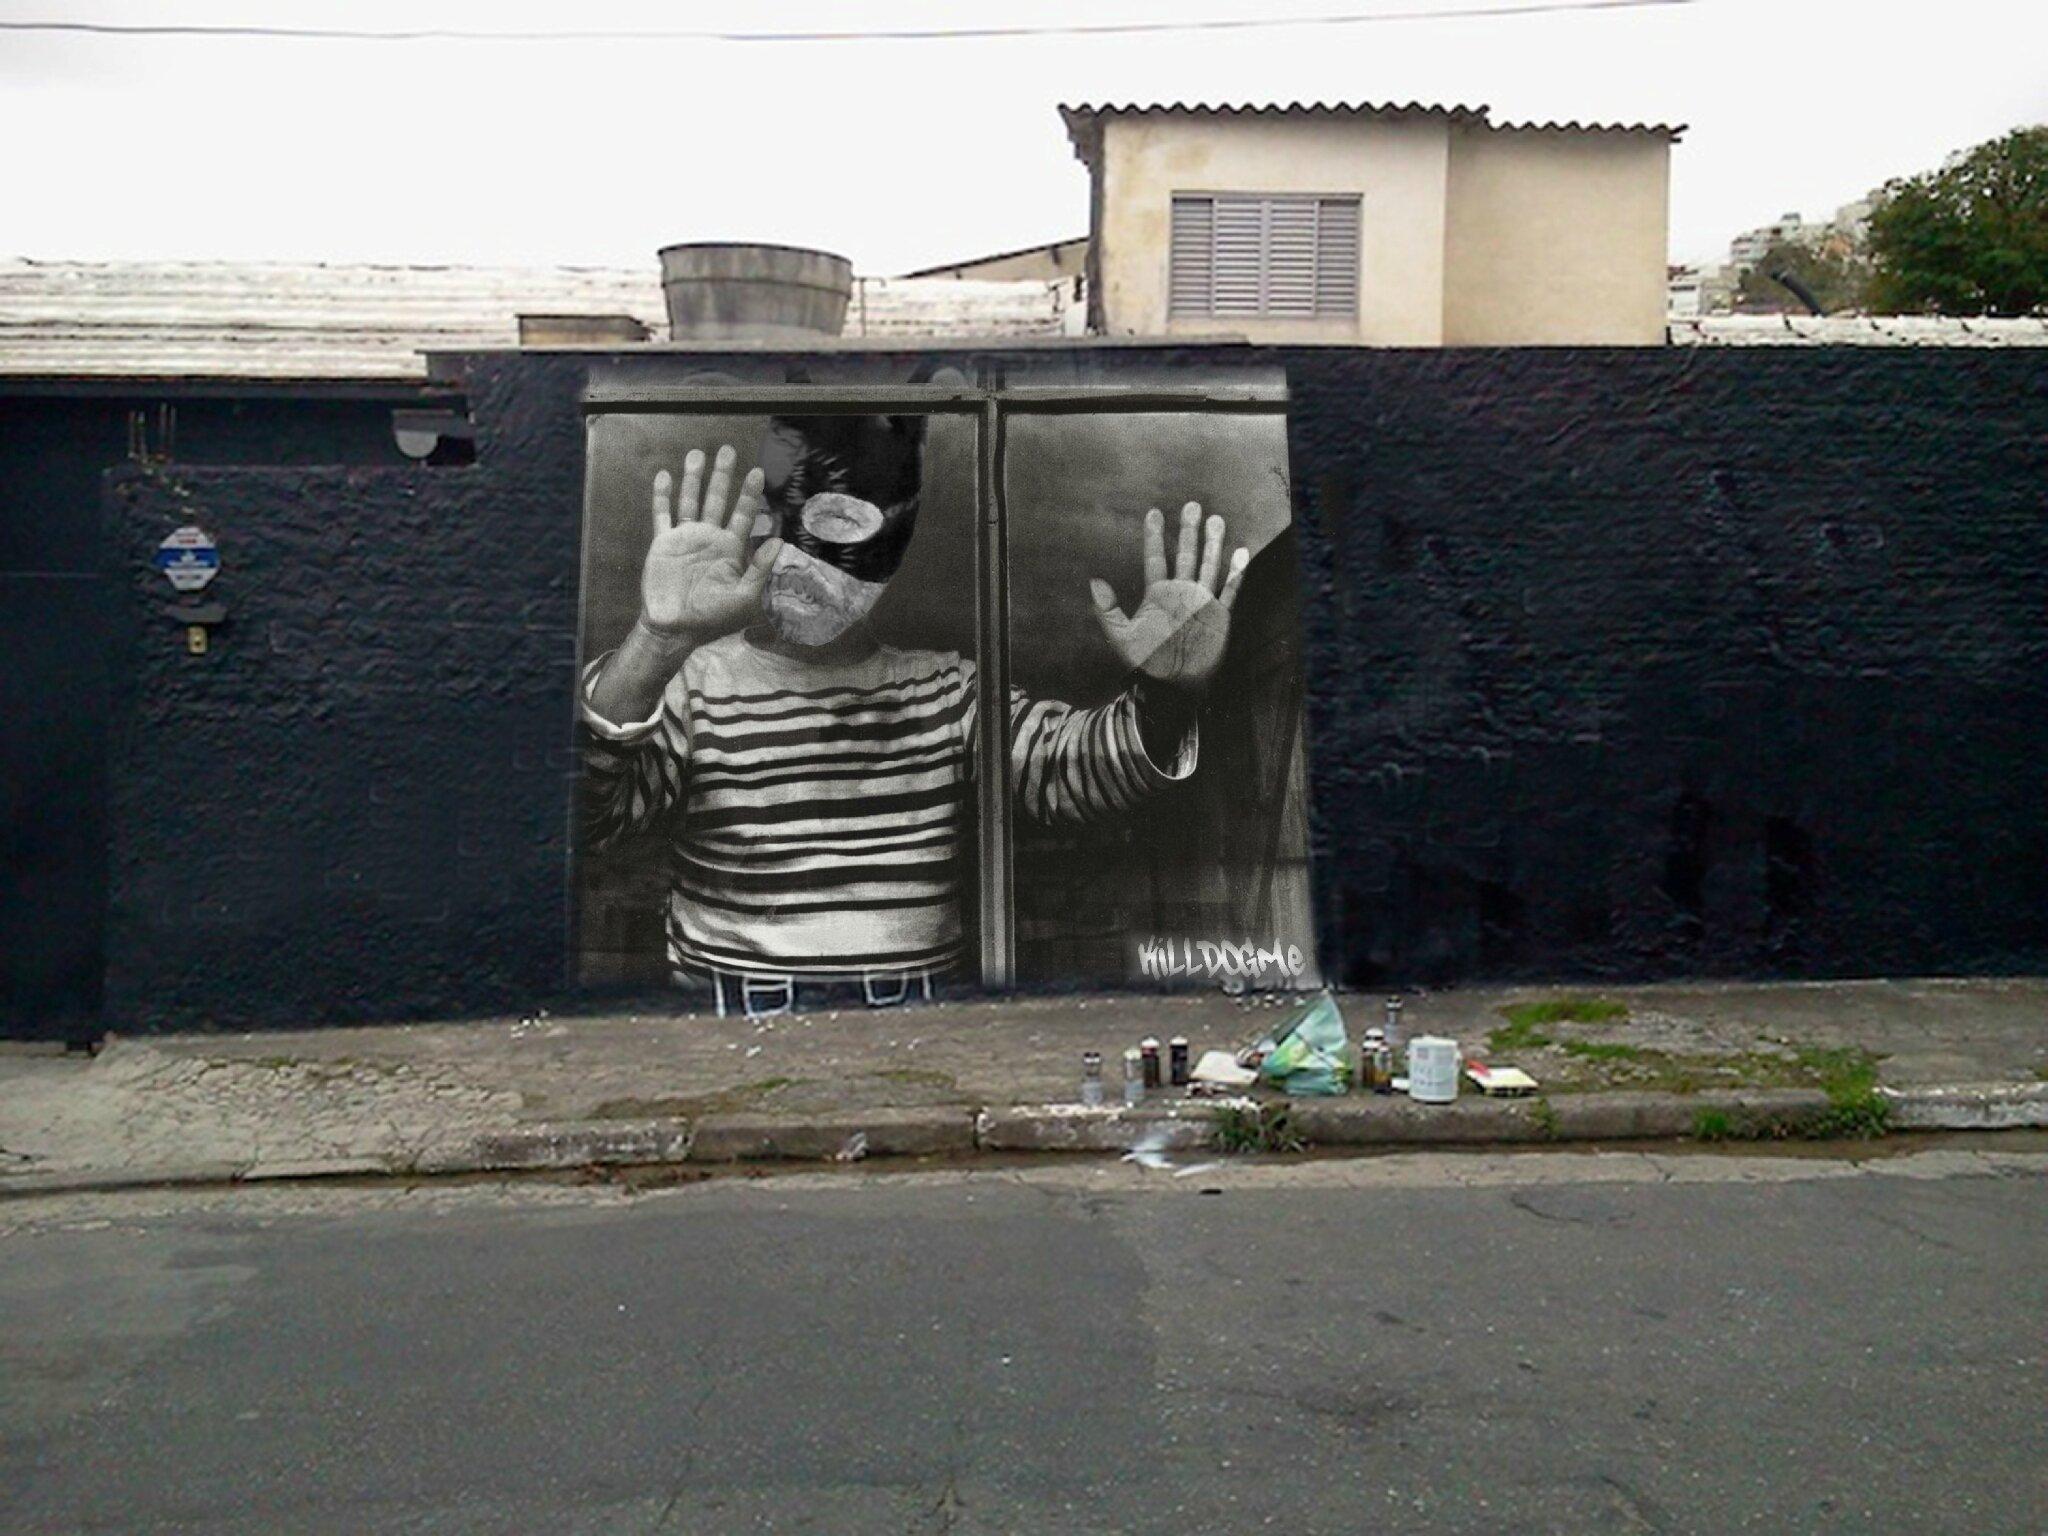 Street-Art-Ushuaïa Ibiza Beach Hotel,ushuaia ibiza,Armin van Buuren, Ushuaia, Ibiza 2014 ,graffiti killdogme,more ibiza,sa trinksa,Jon Sa Trinxa,dalt vila ibiza,biza,mama pomelo dalt vila,killdogme,lucian freud,graffiti artist,urban art,street artist,aeros